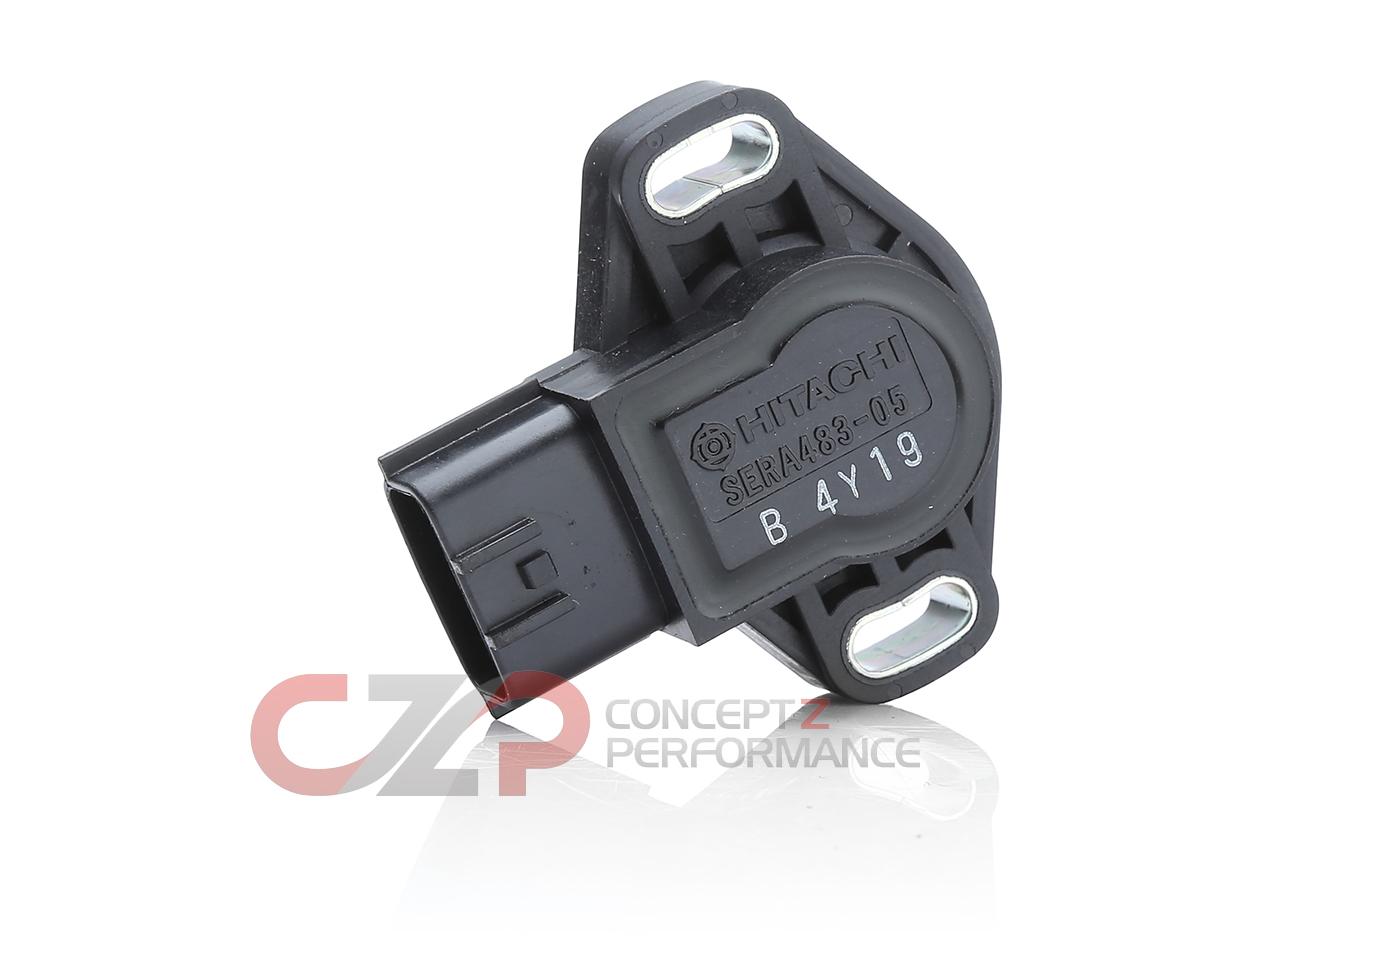 1  Zx Injector Wiring Diagram on fuse box, seat wiring, twin turbo engine vacuum, ptu sub harness wire, turbo vacuum,